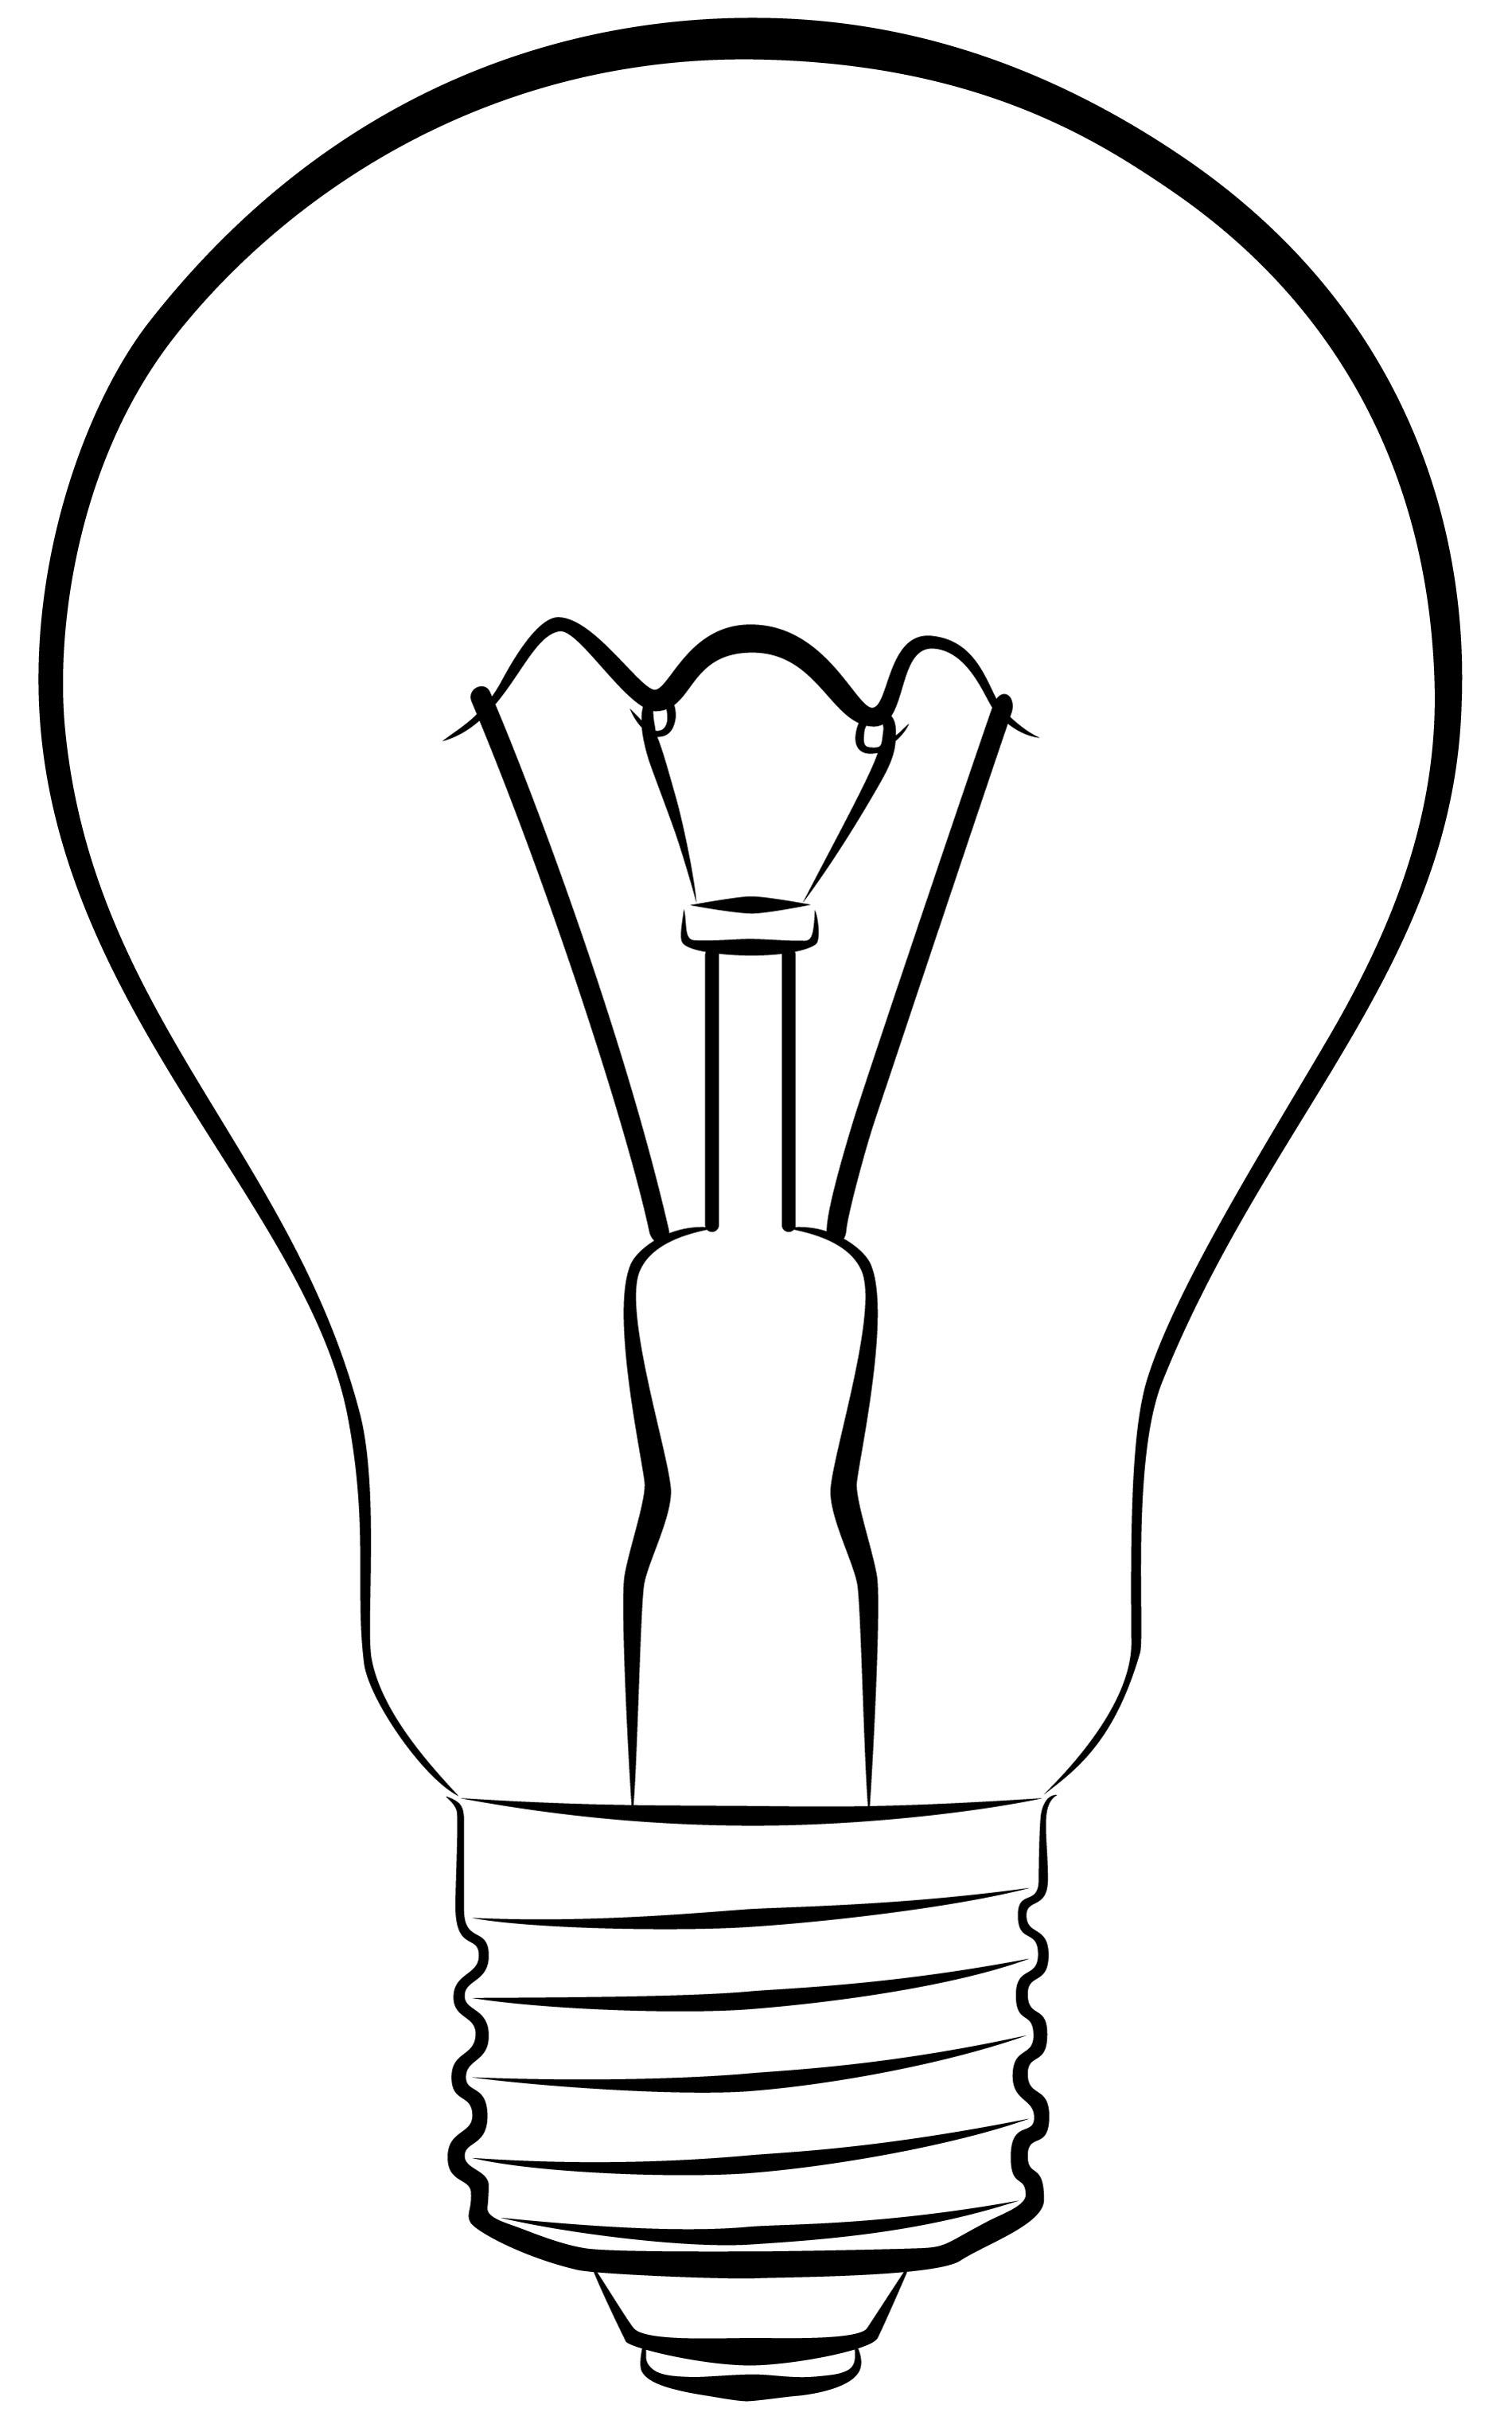 Drawn lamp light globe Thinking Bulb light Clip loss